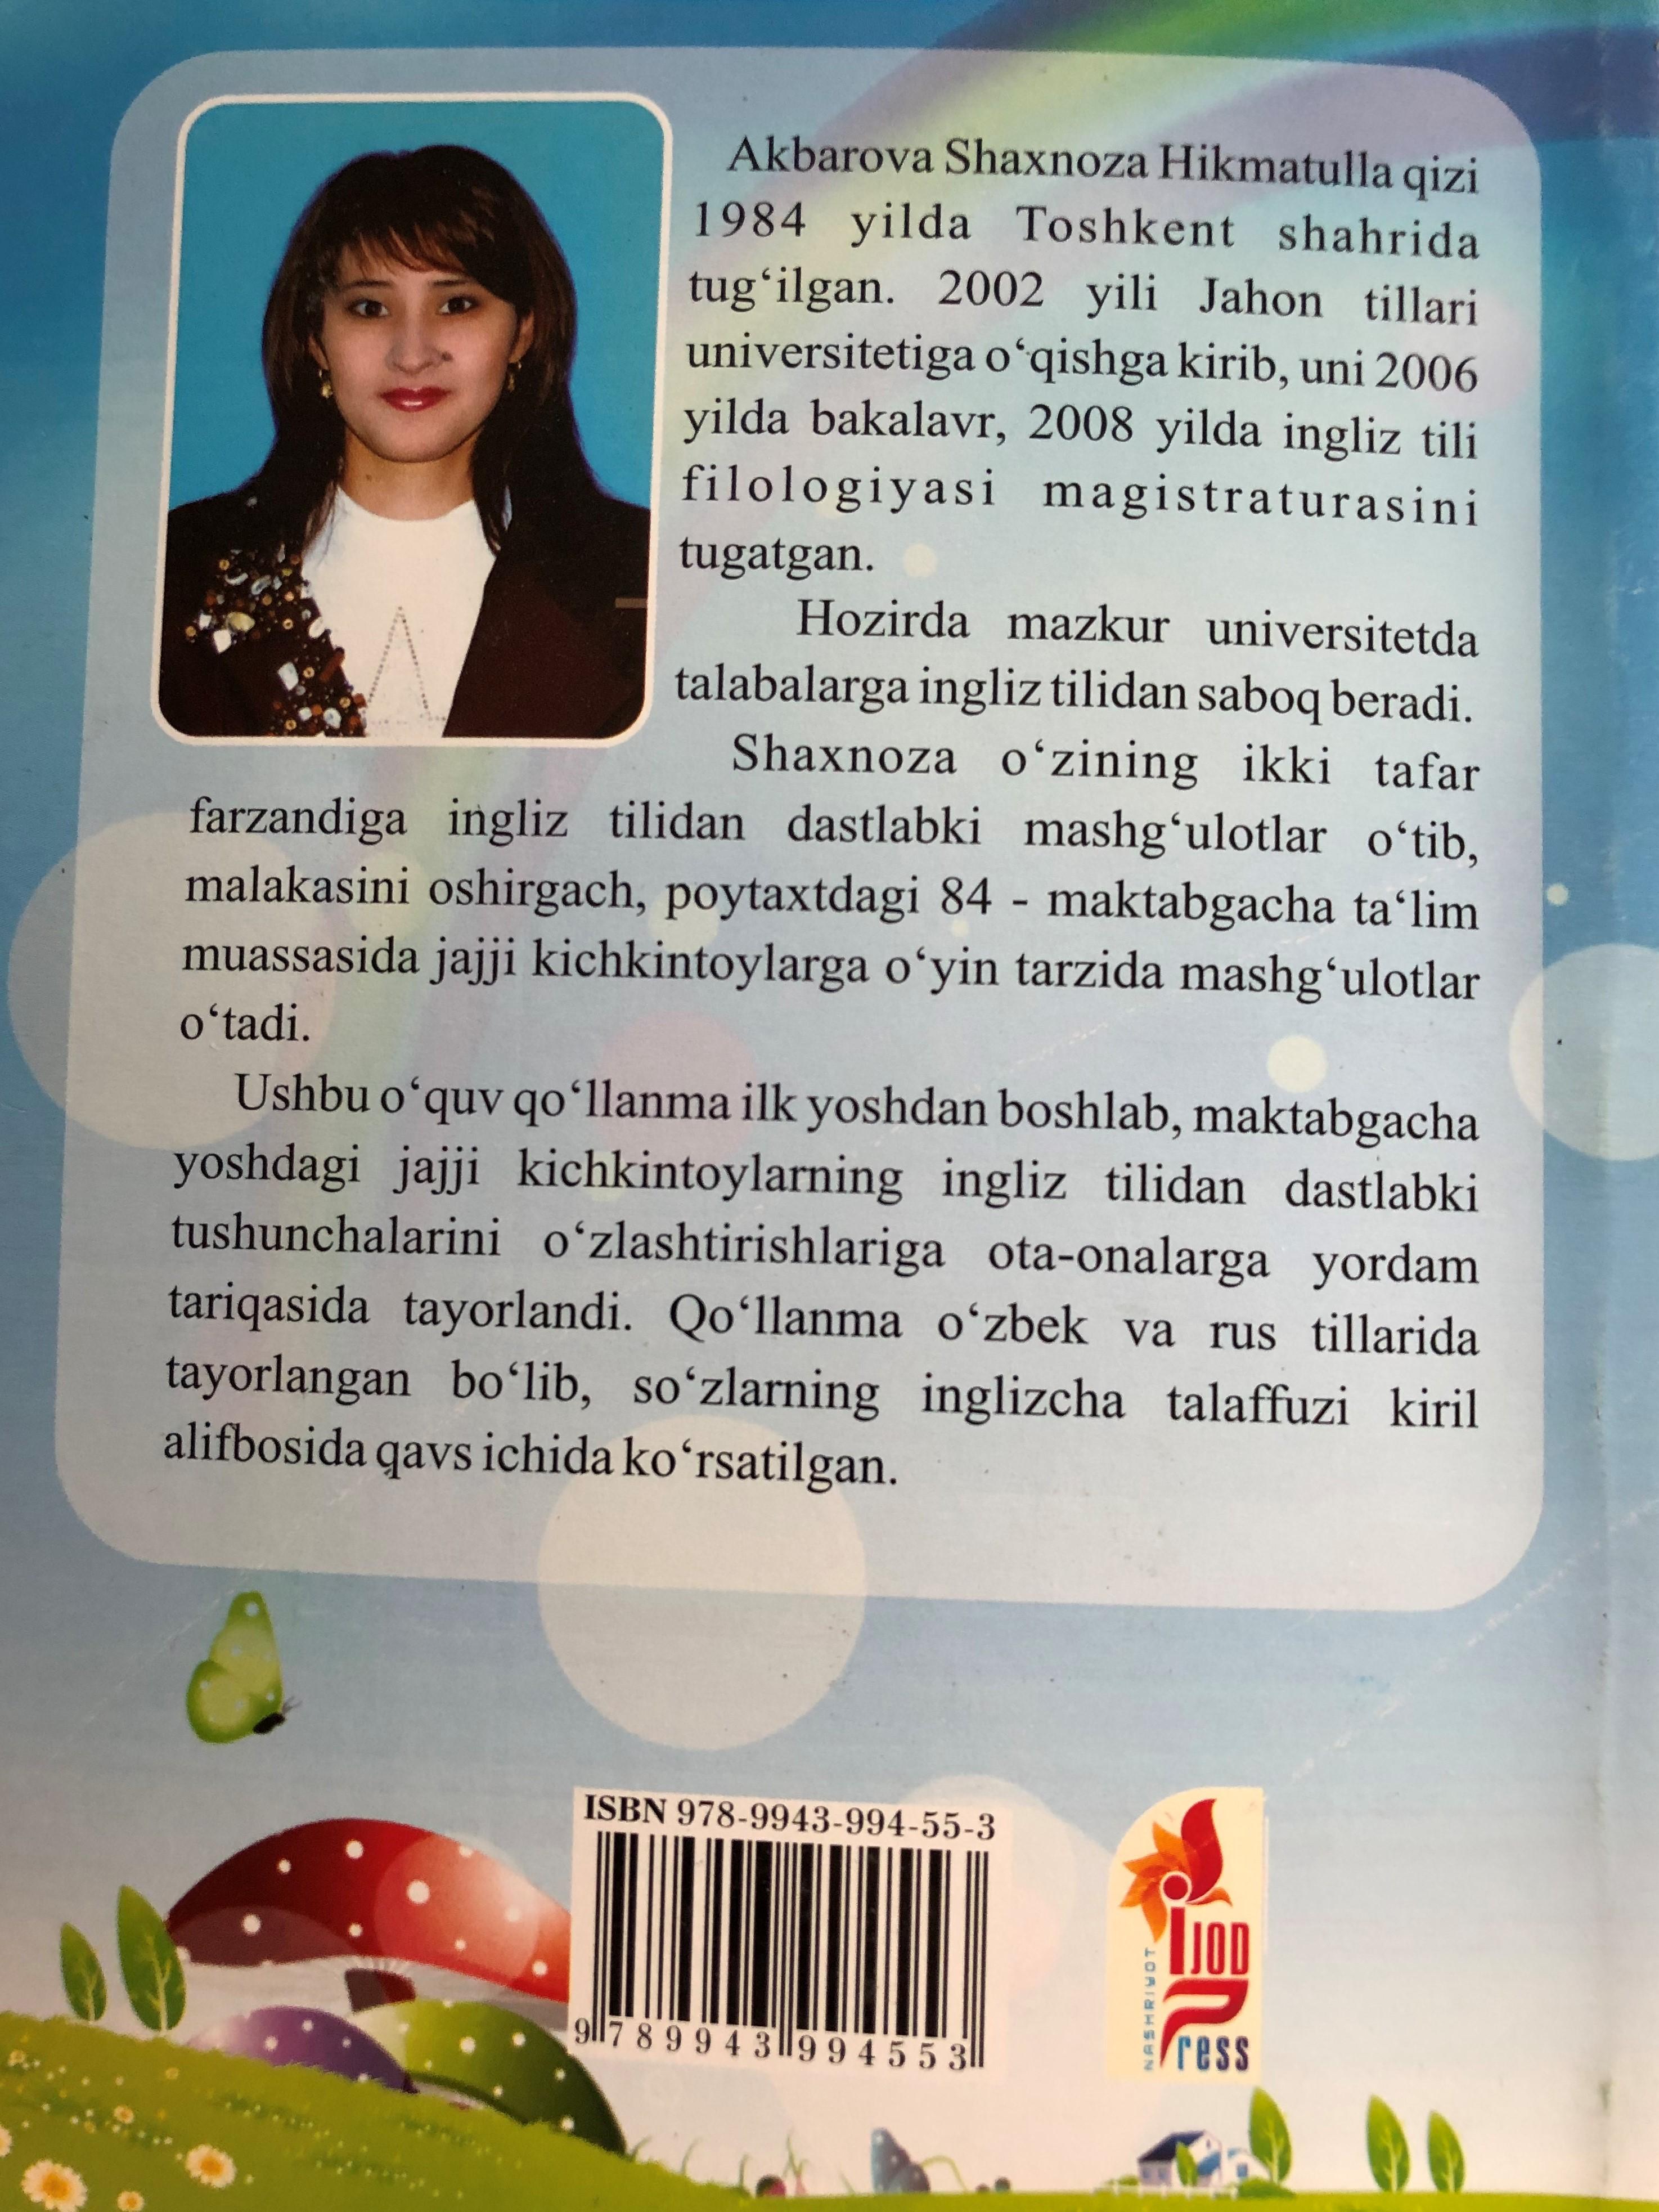 bolajonlar-uchun-ingliz-tili-by-shahnoza-akbarova-english-for-kids-allovance-for-preschoolers-parents-and-caregivers-uzbek-russian-english-learning-book-paperback-color-pages-ijod-press-2017-14-.jpg